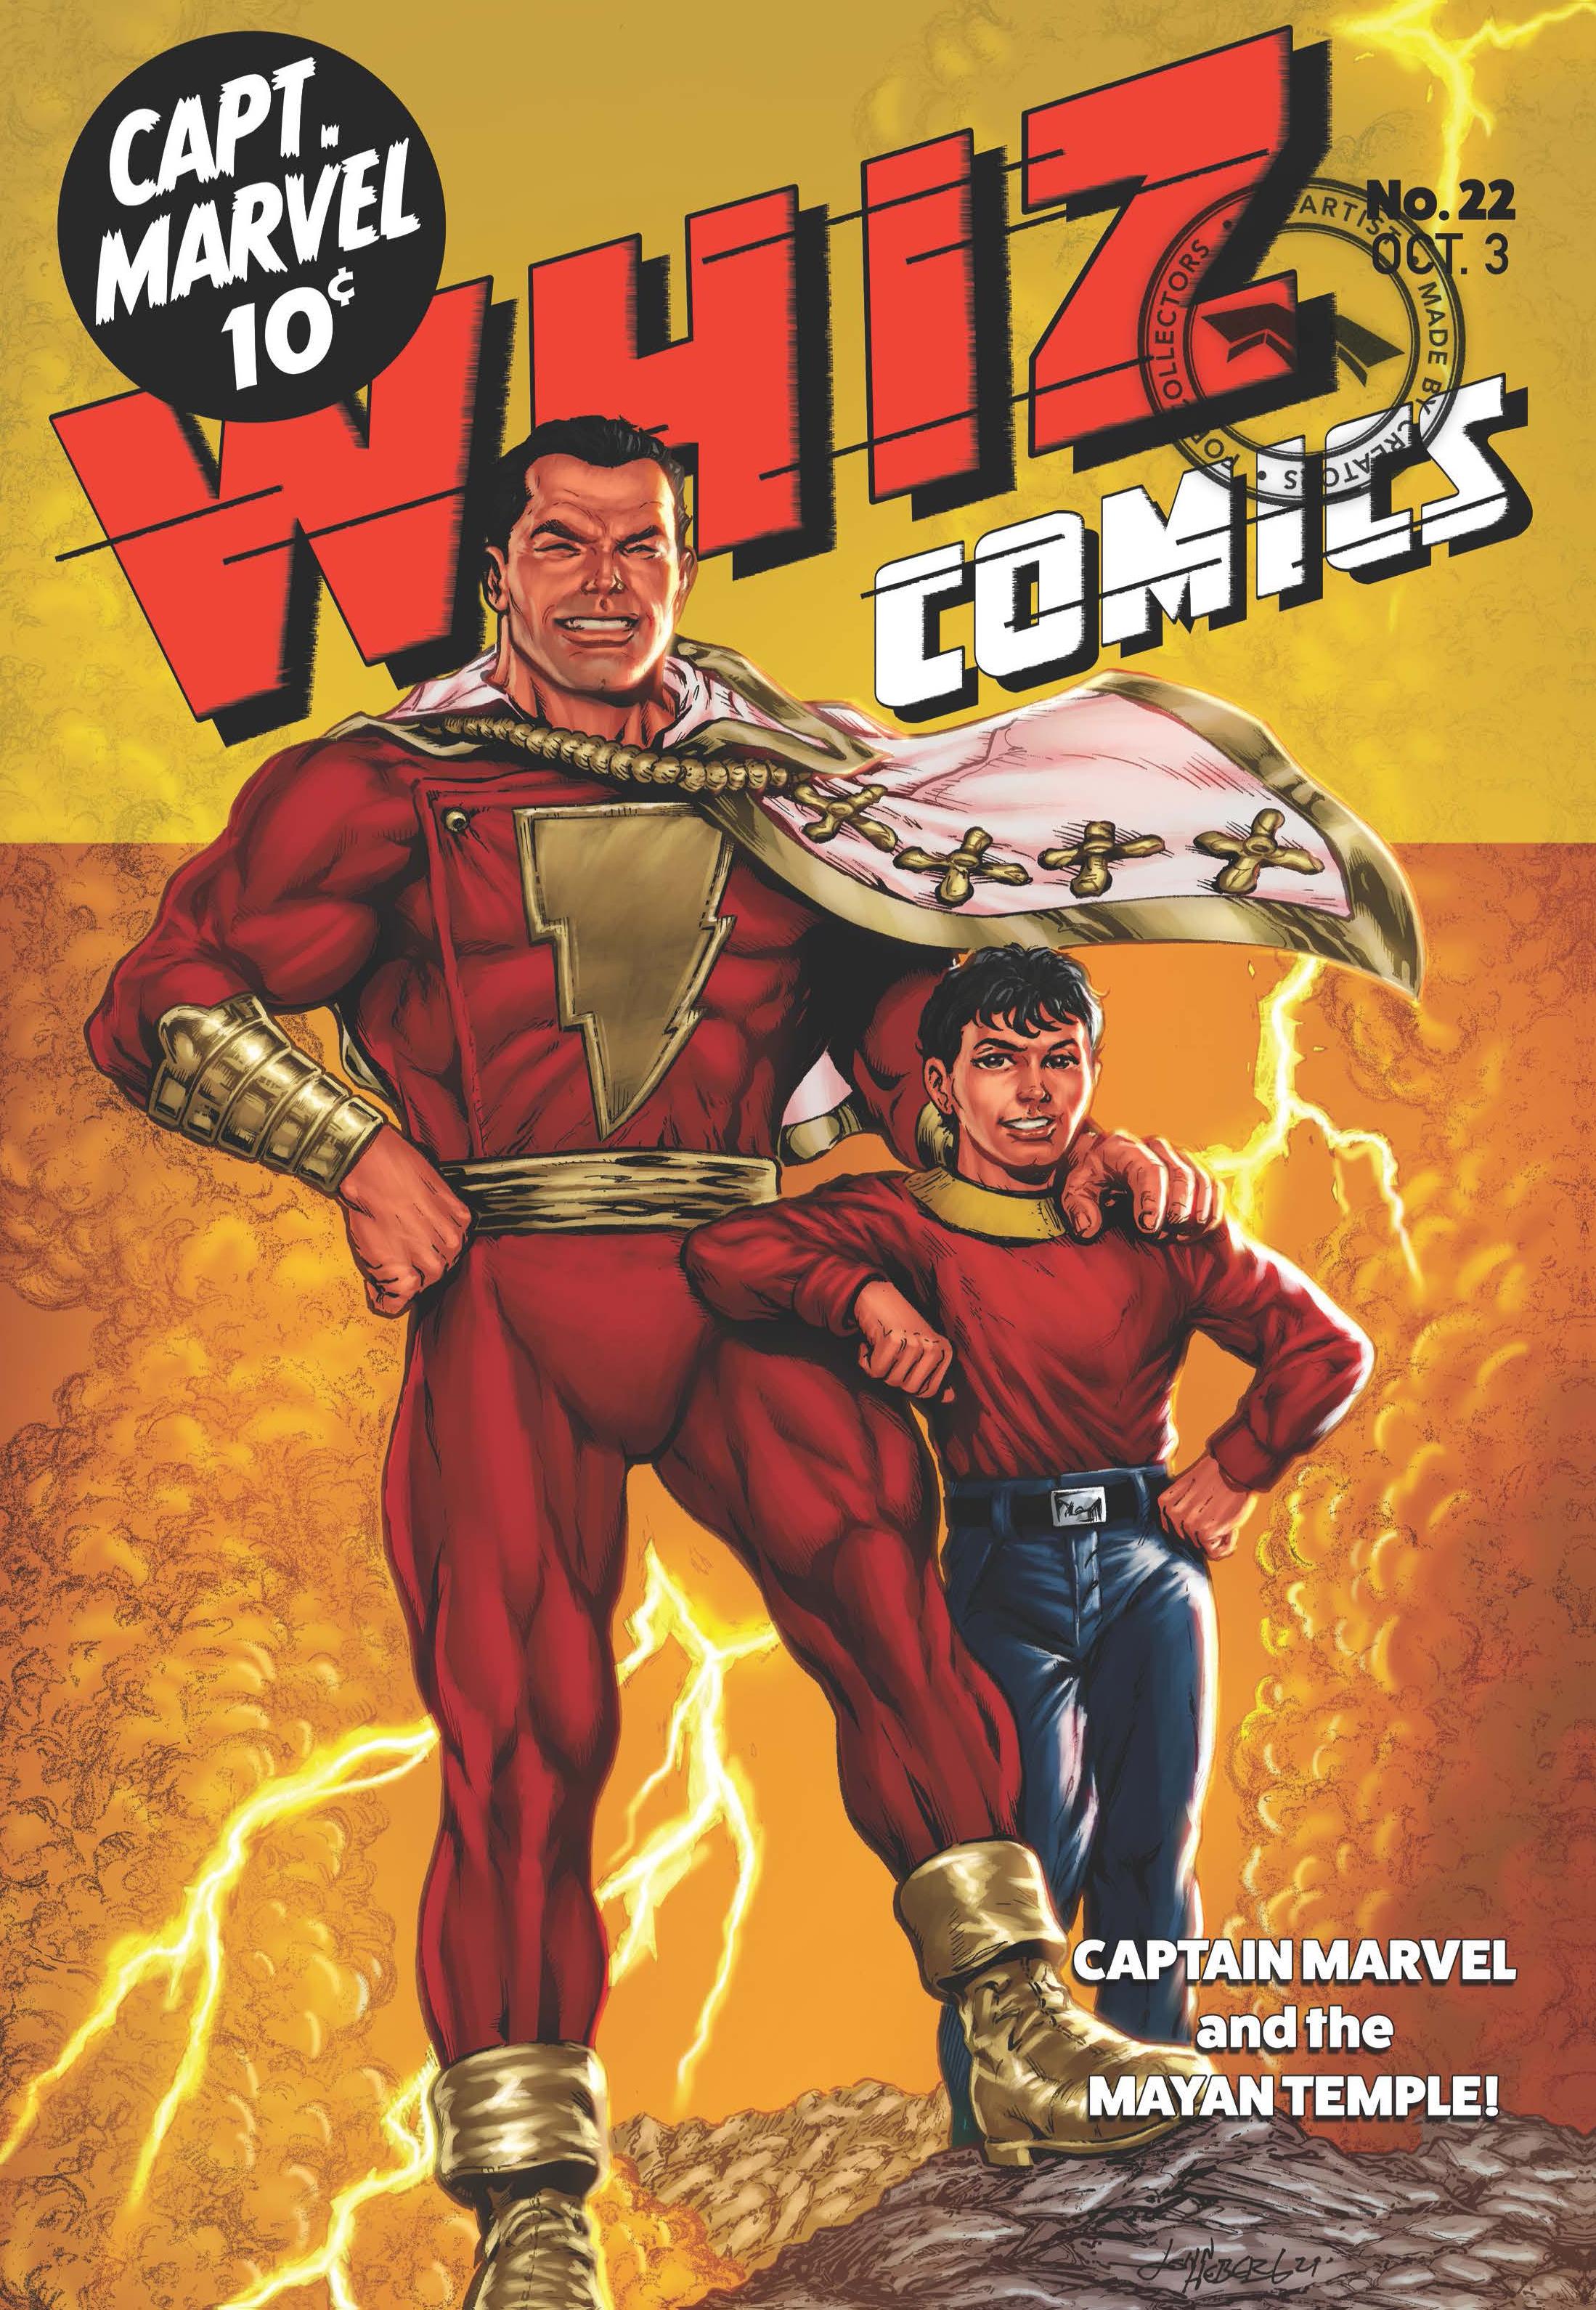 WHIZ COMICS #22: COVER RECREATION, FACSIMILE REPRINT